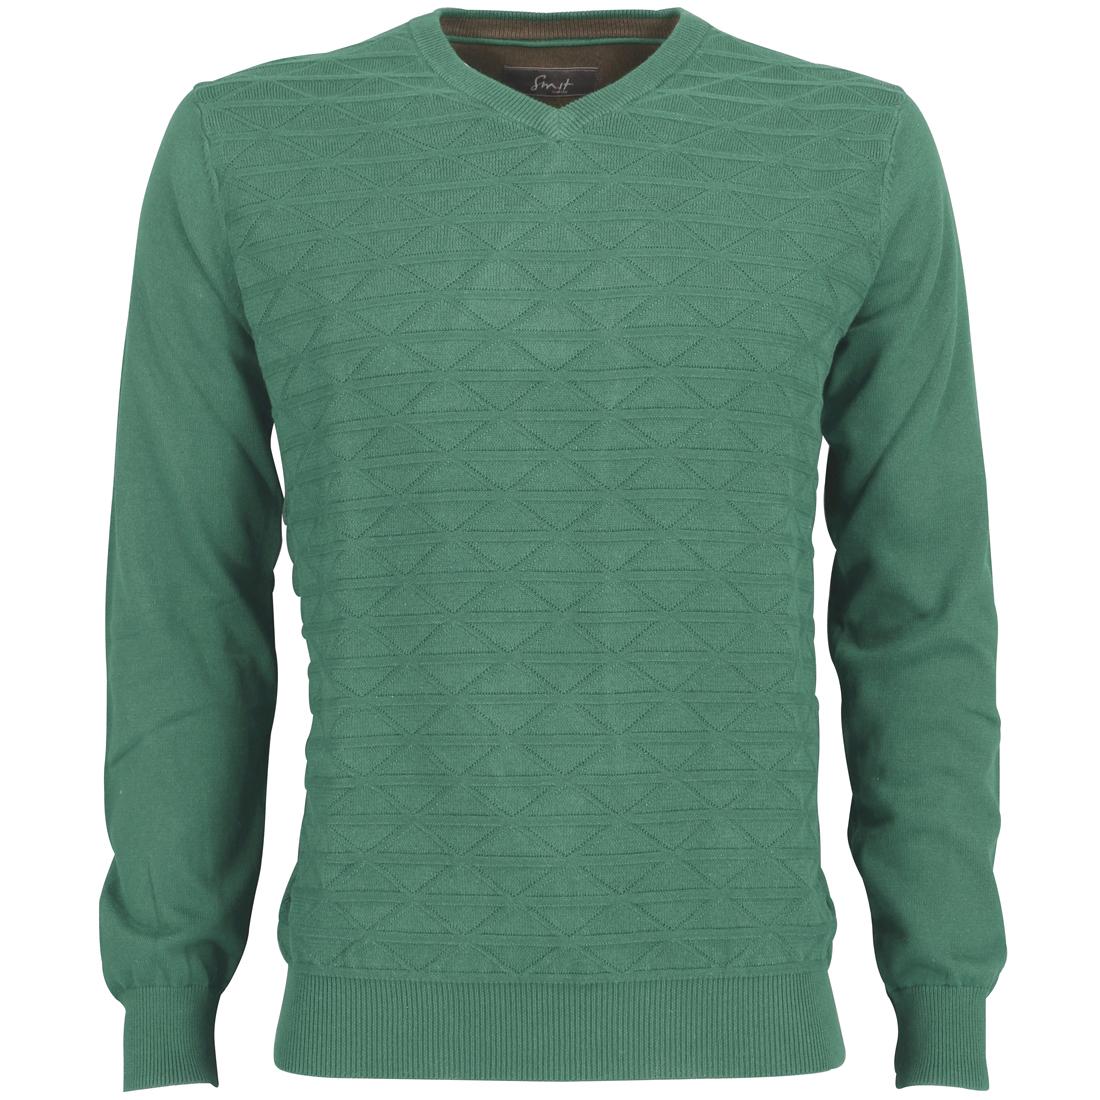 Smit Mode trui 82-8106-6 in het Donker Groen